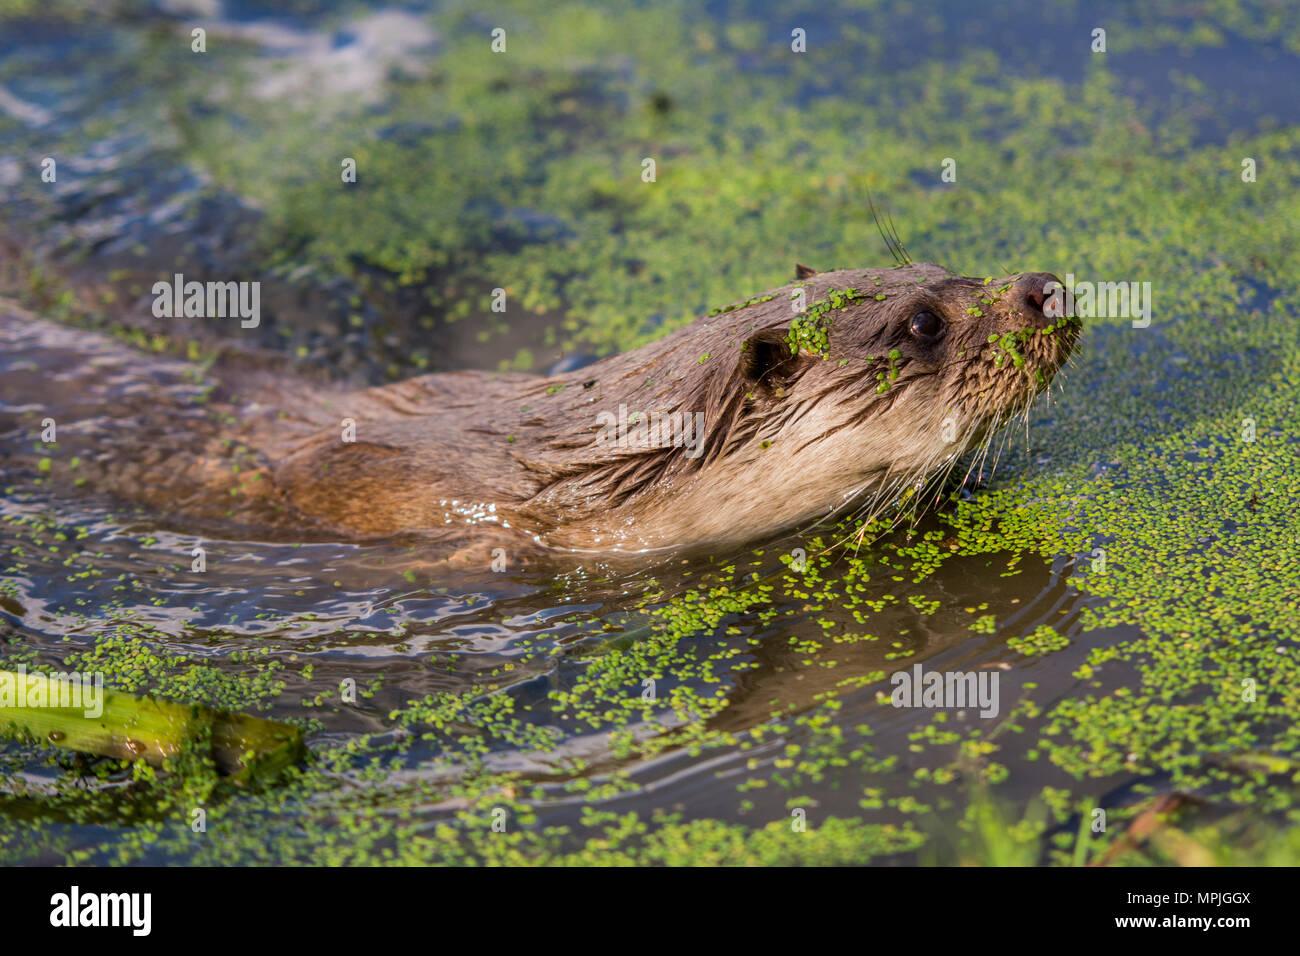 Otter swimming towards the bank through algae - Stock Image